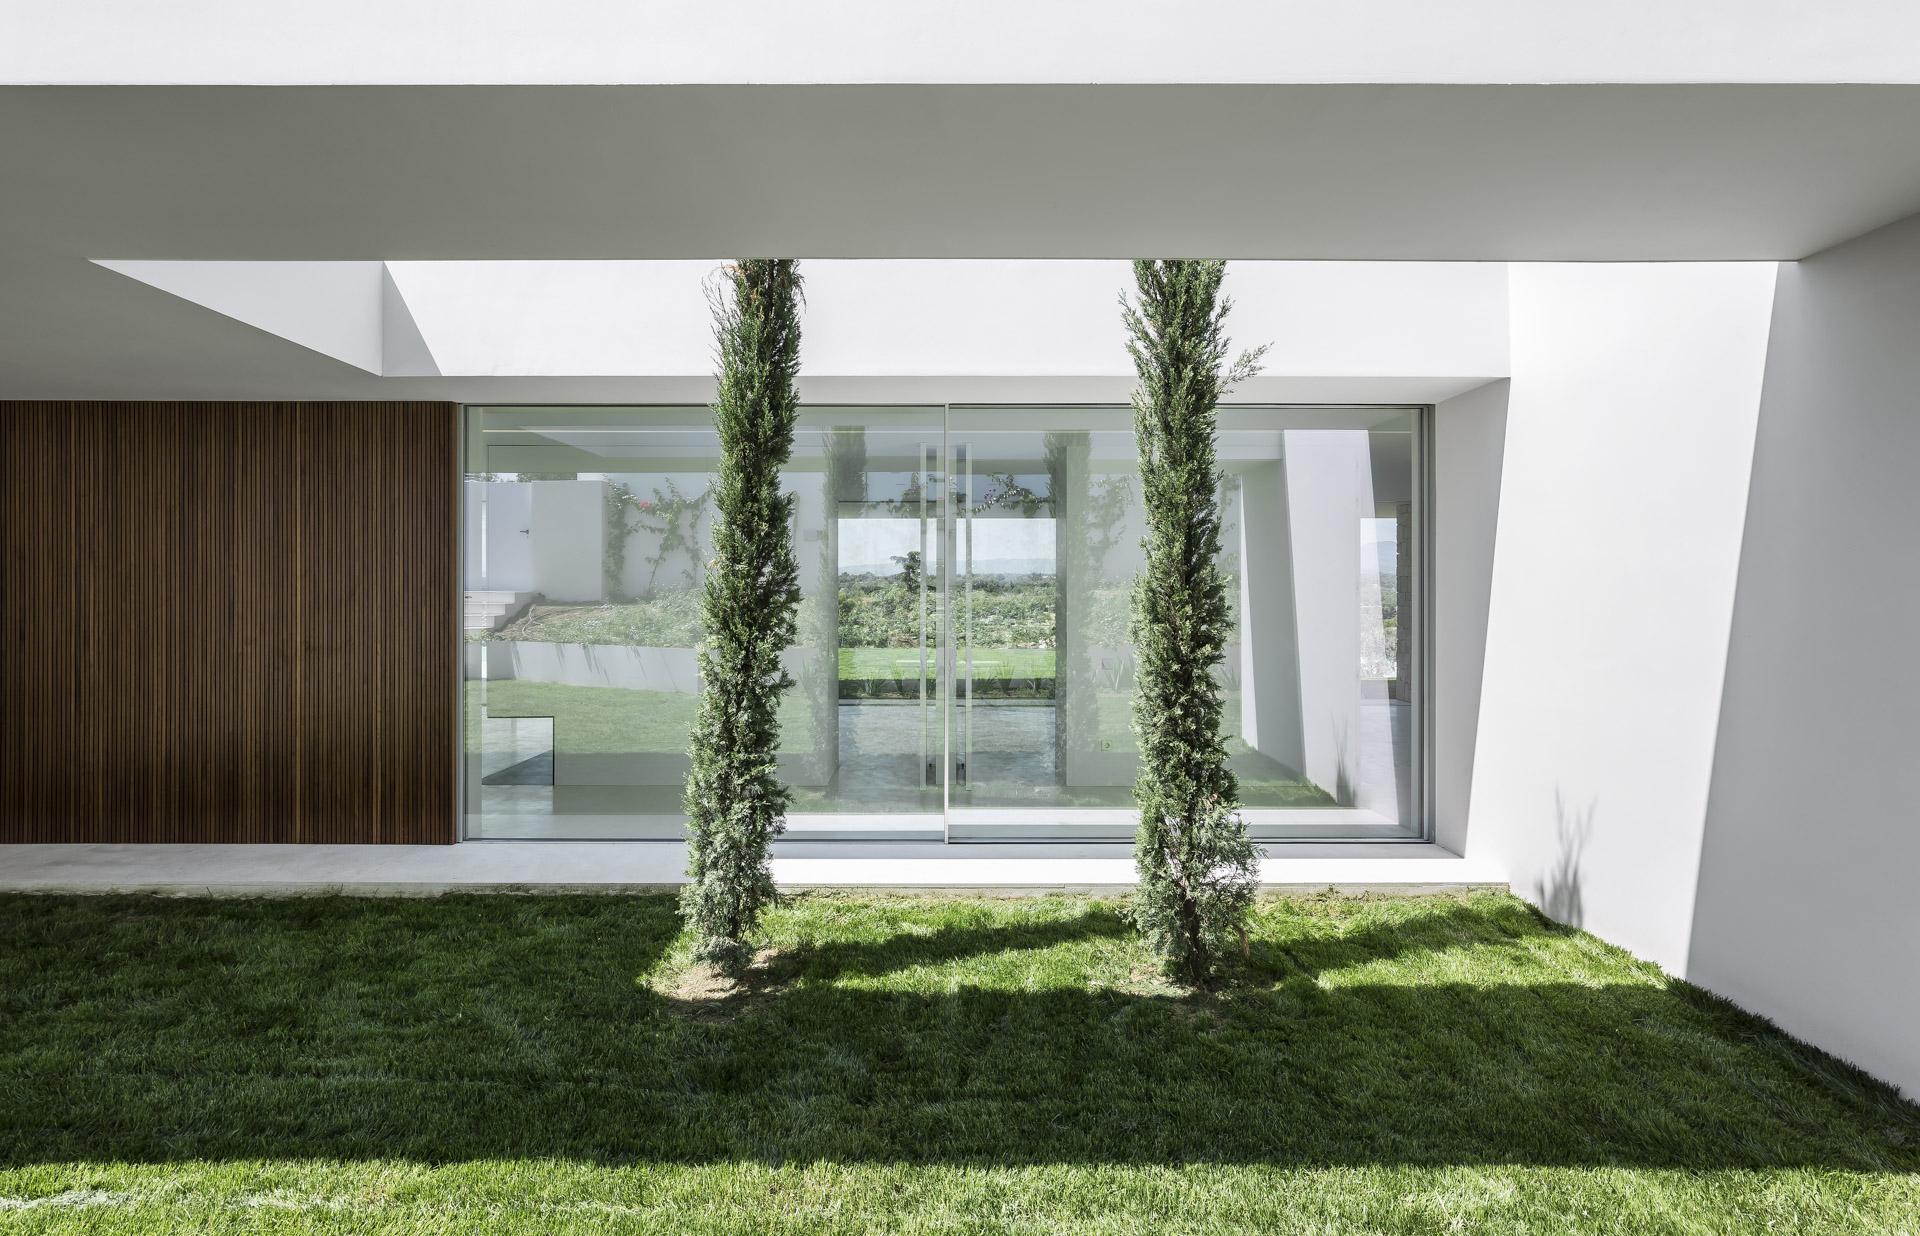 fotografia-arquitectura-valencia-german-cabo-gallardo-llopis-villamarchante-vivienda-07